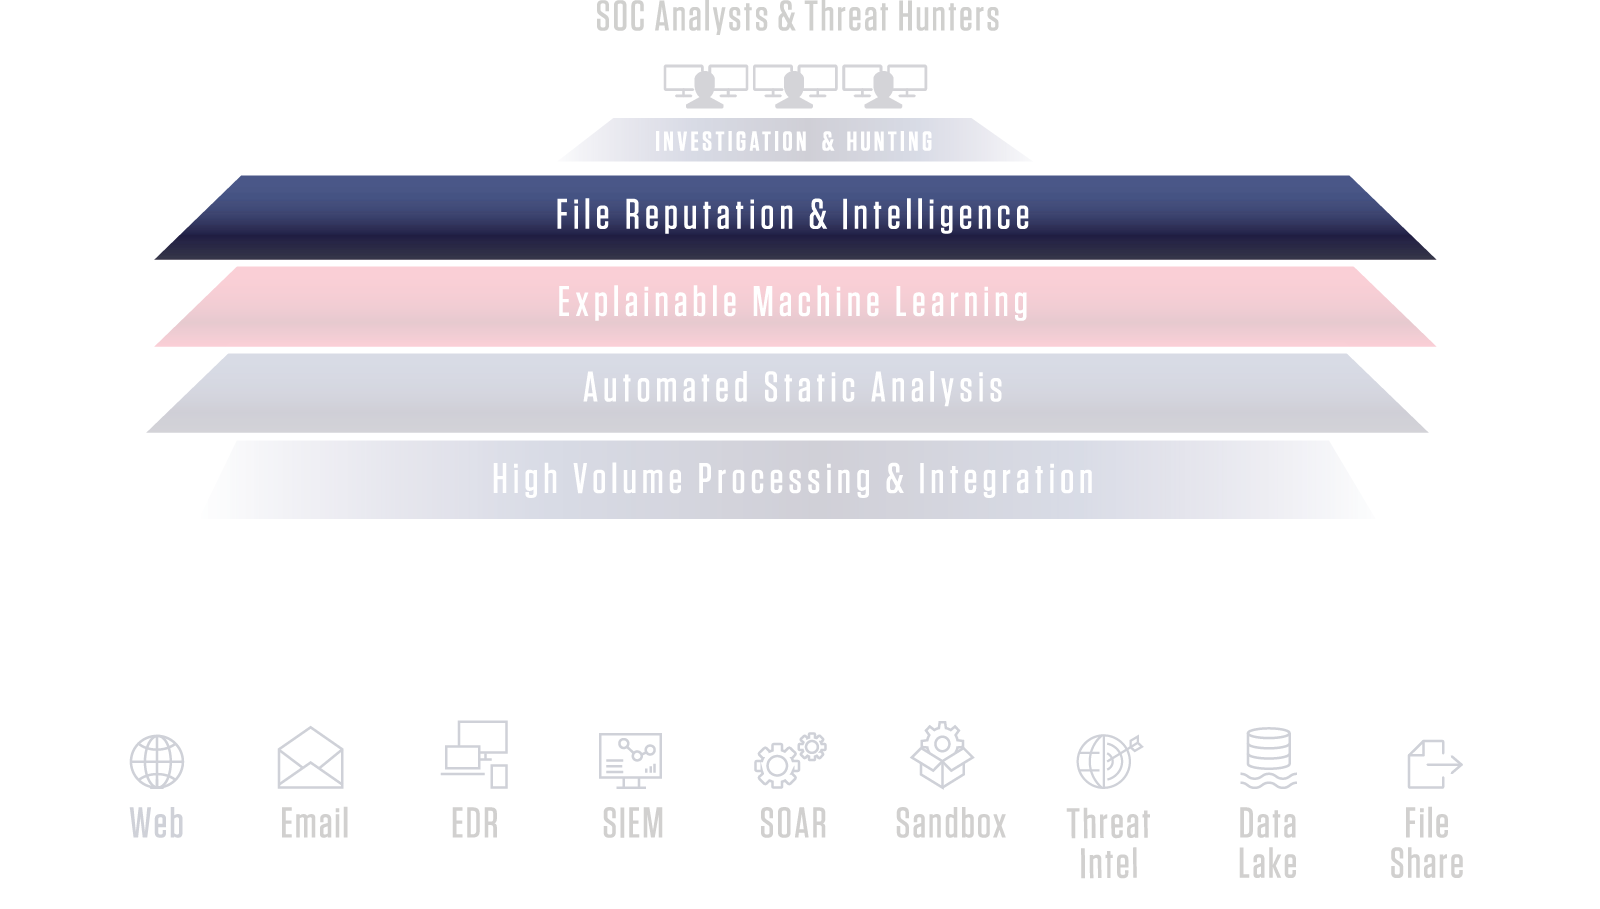 File Reputation & Intelligence